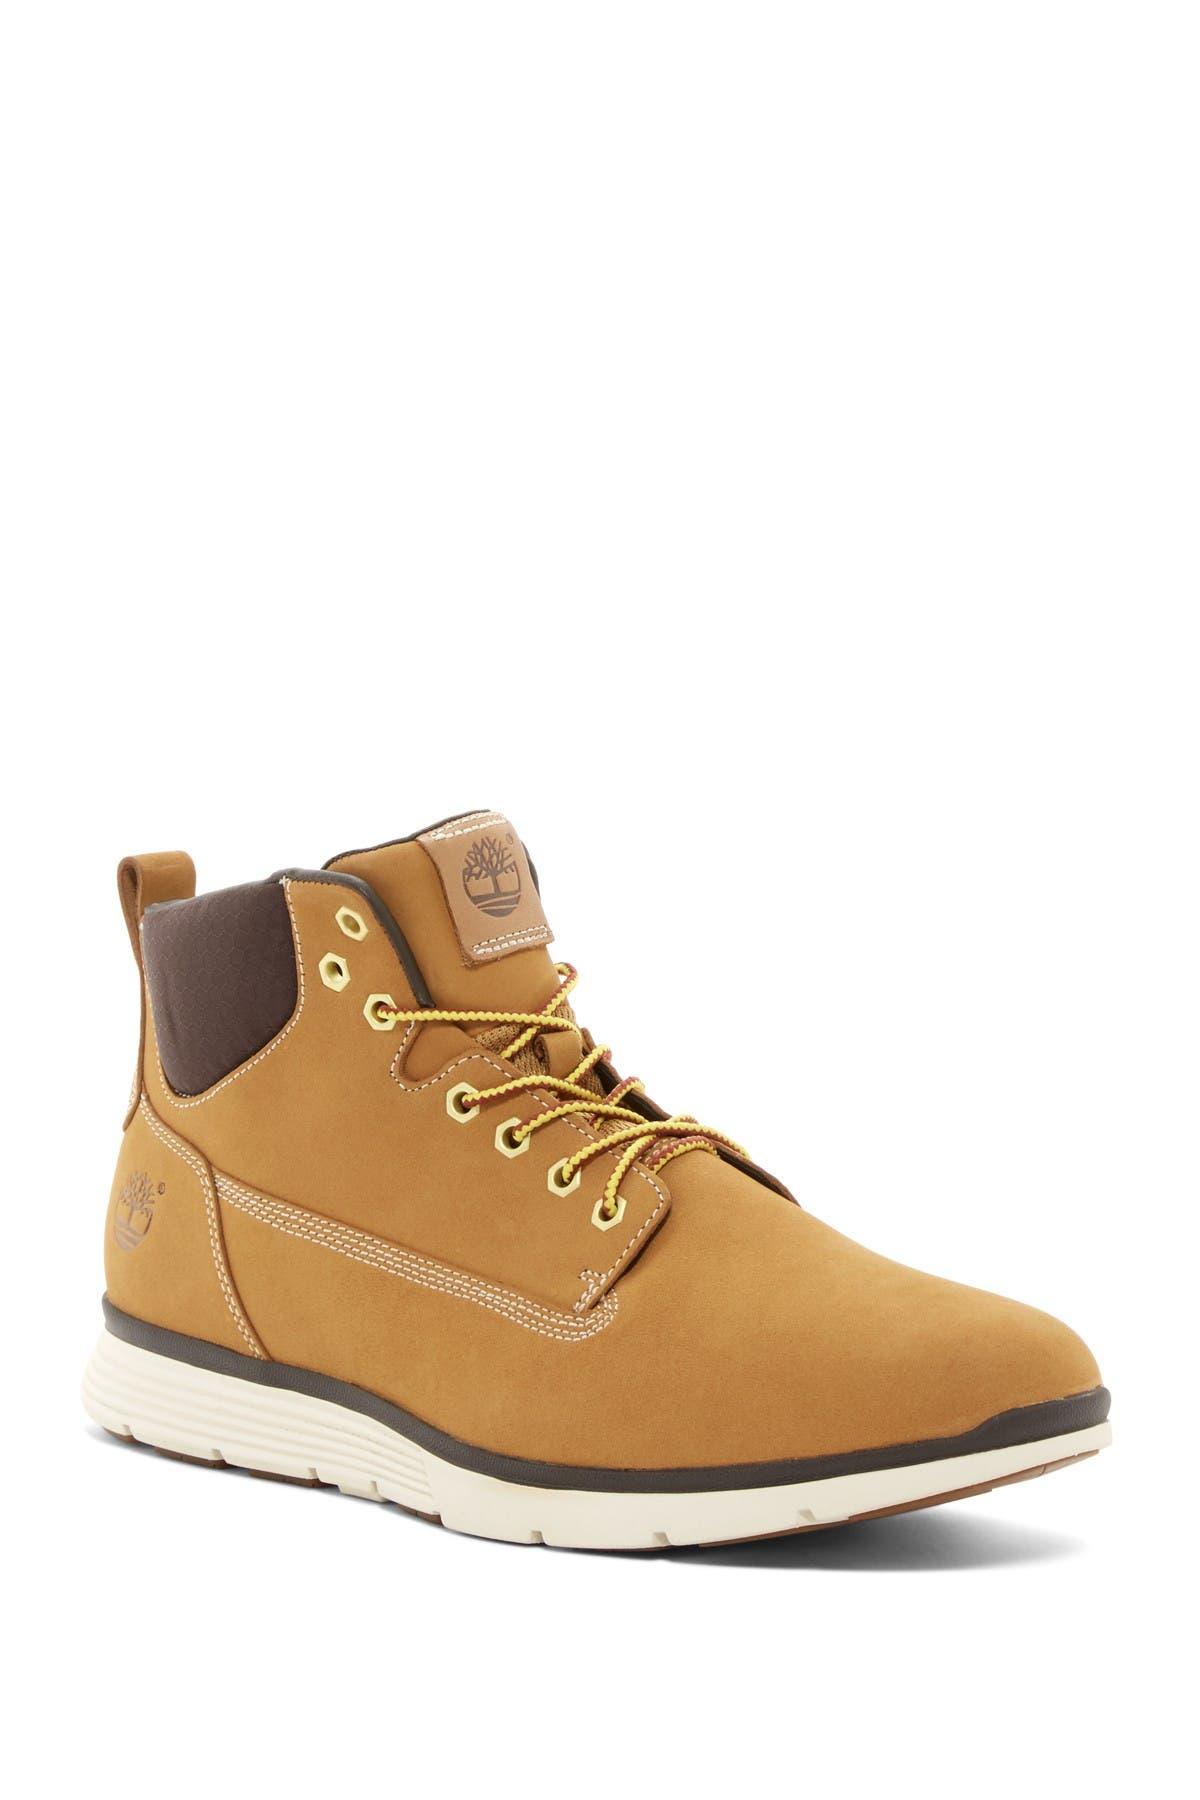 Image of Timberland Killington Leather Chukka Boot